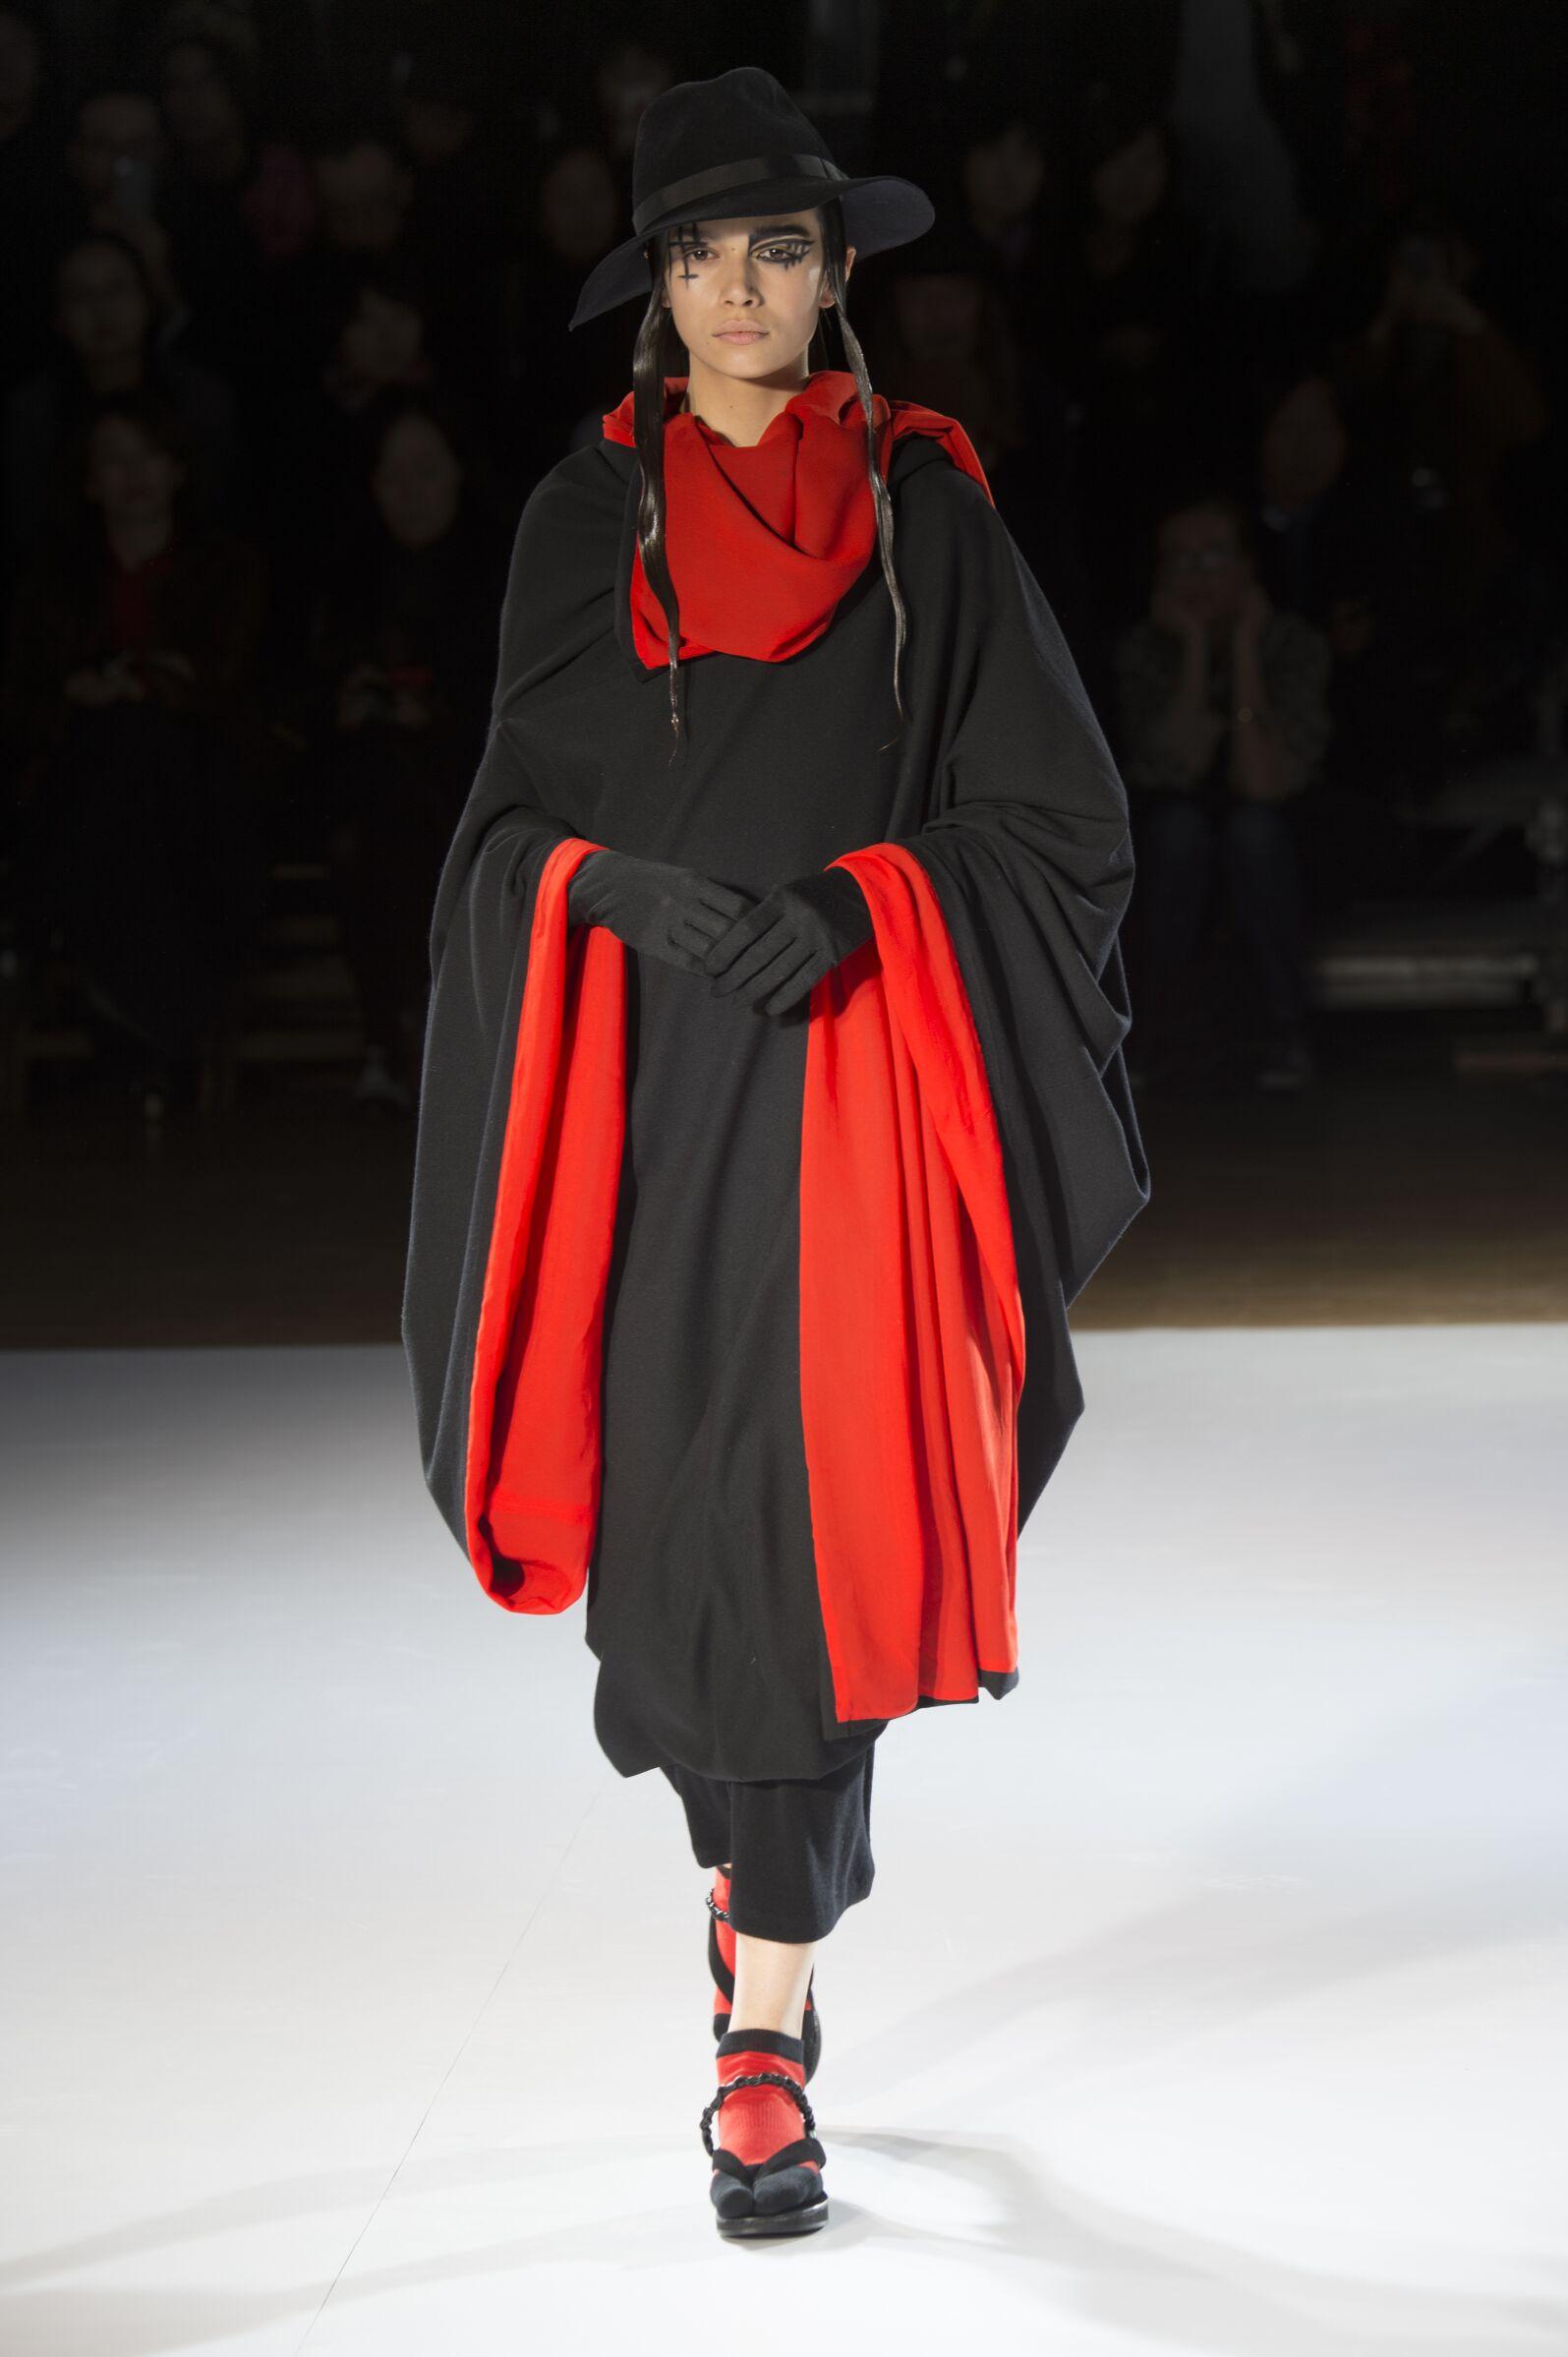 Yohji Yamamoto Fall Winter 2015 16 Womenswear Collection Paris Fashion Week Fashion Show